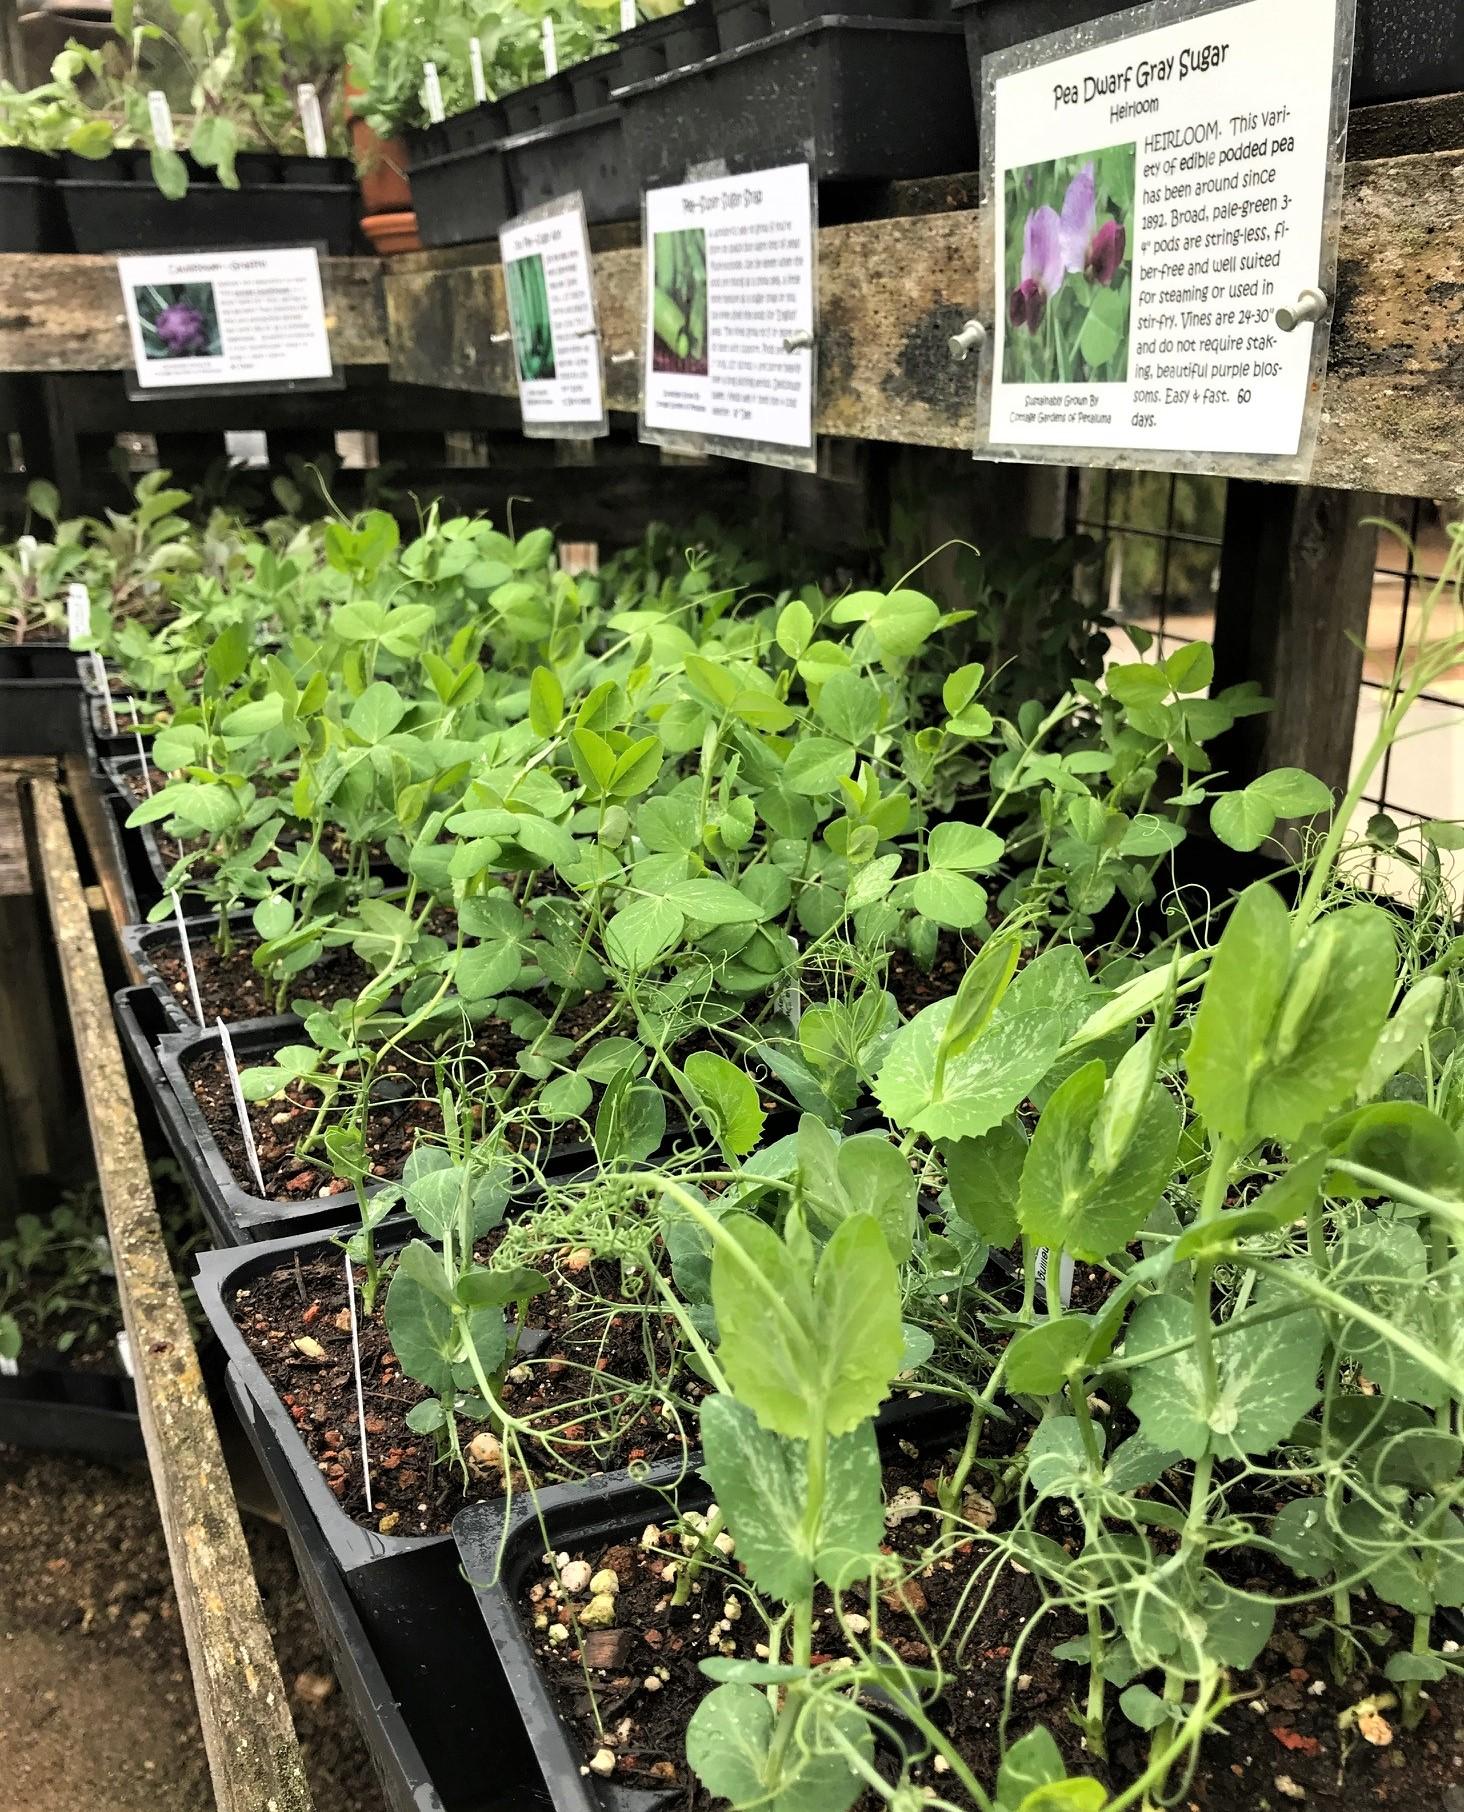 Pea plant transplants on a table